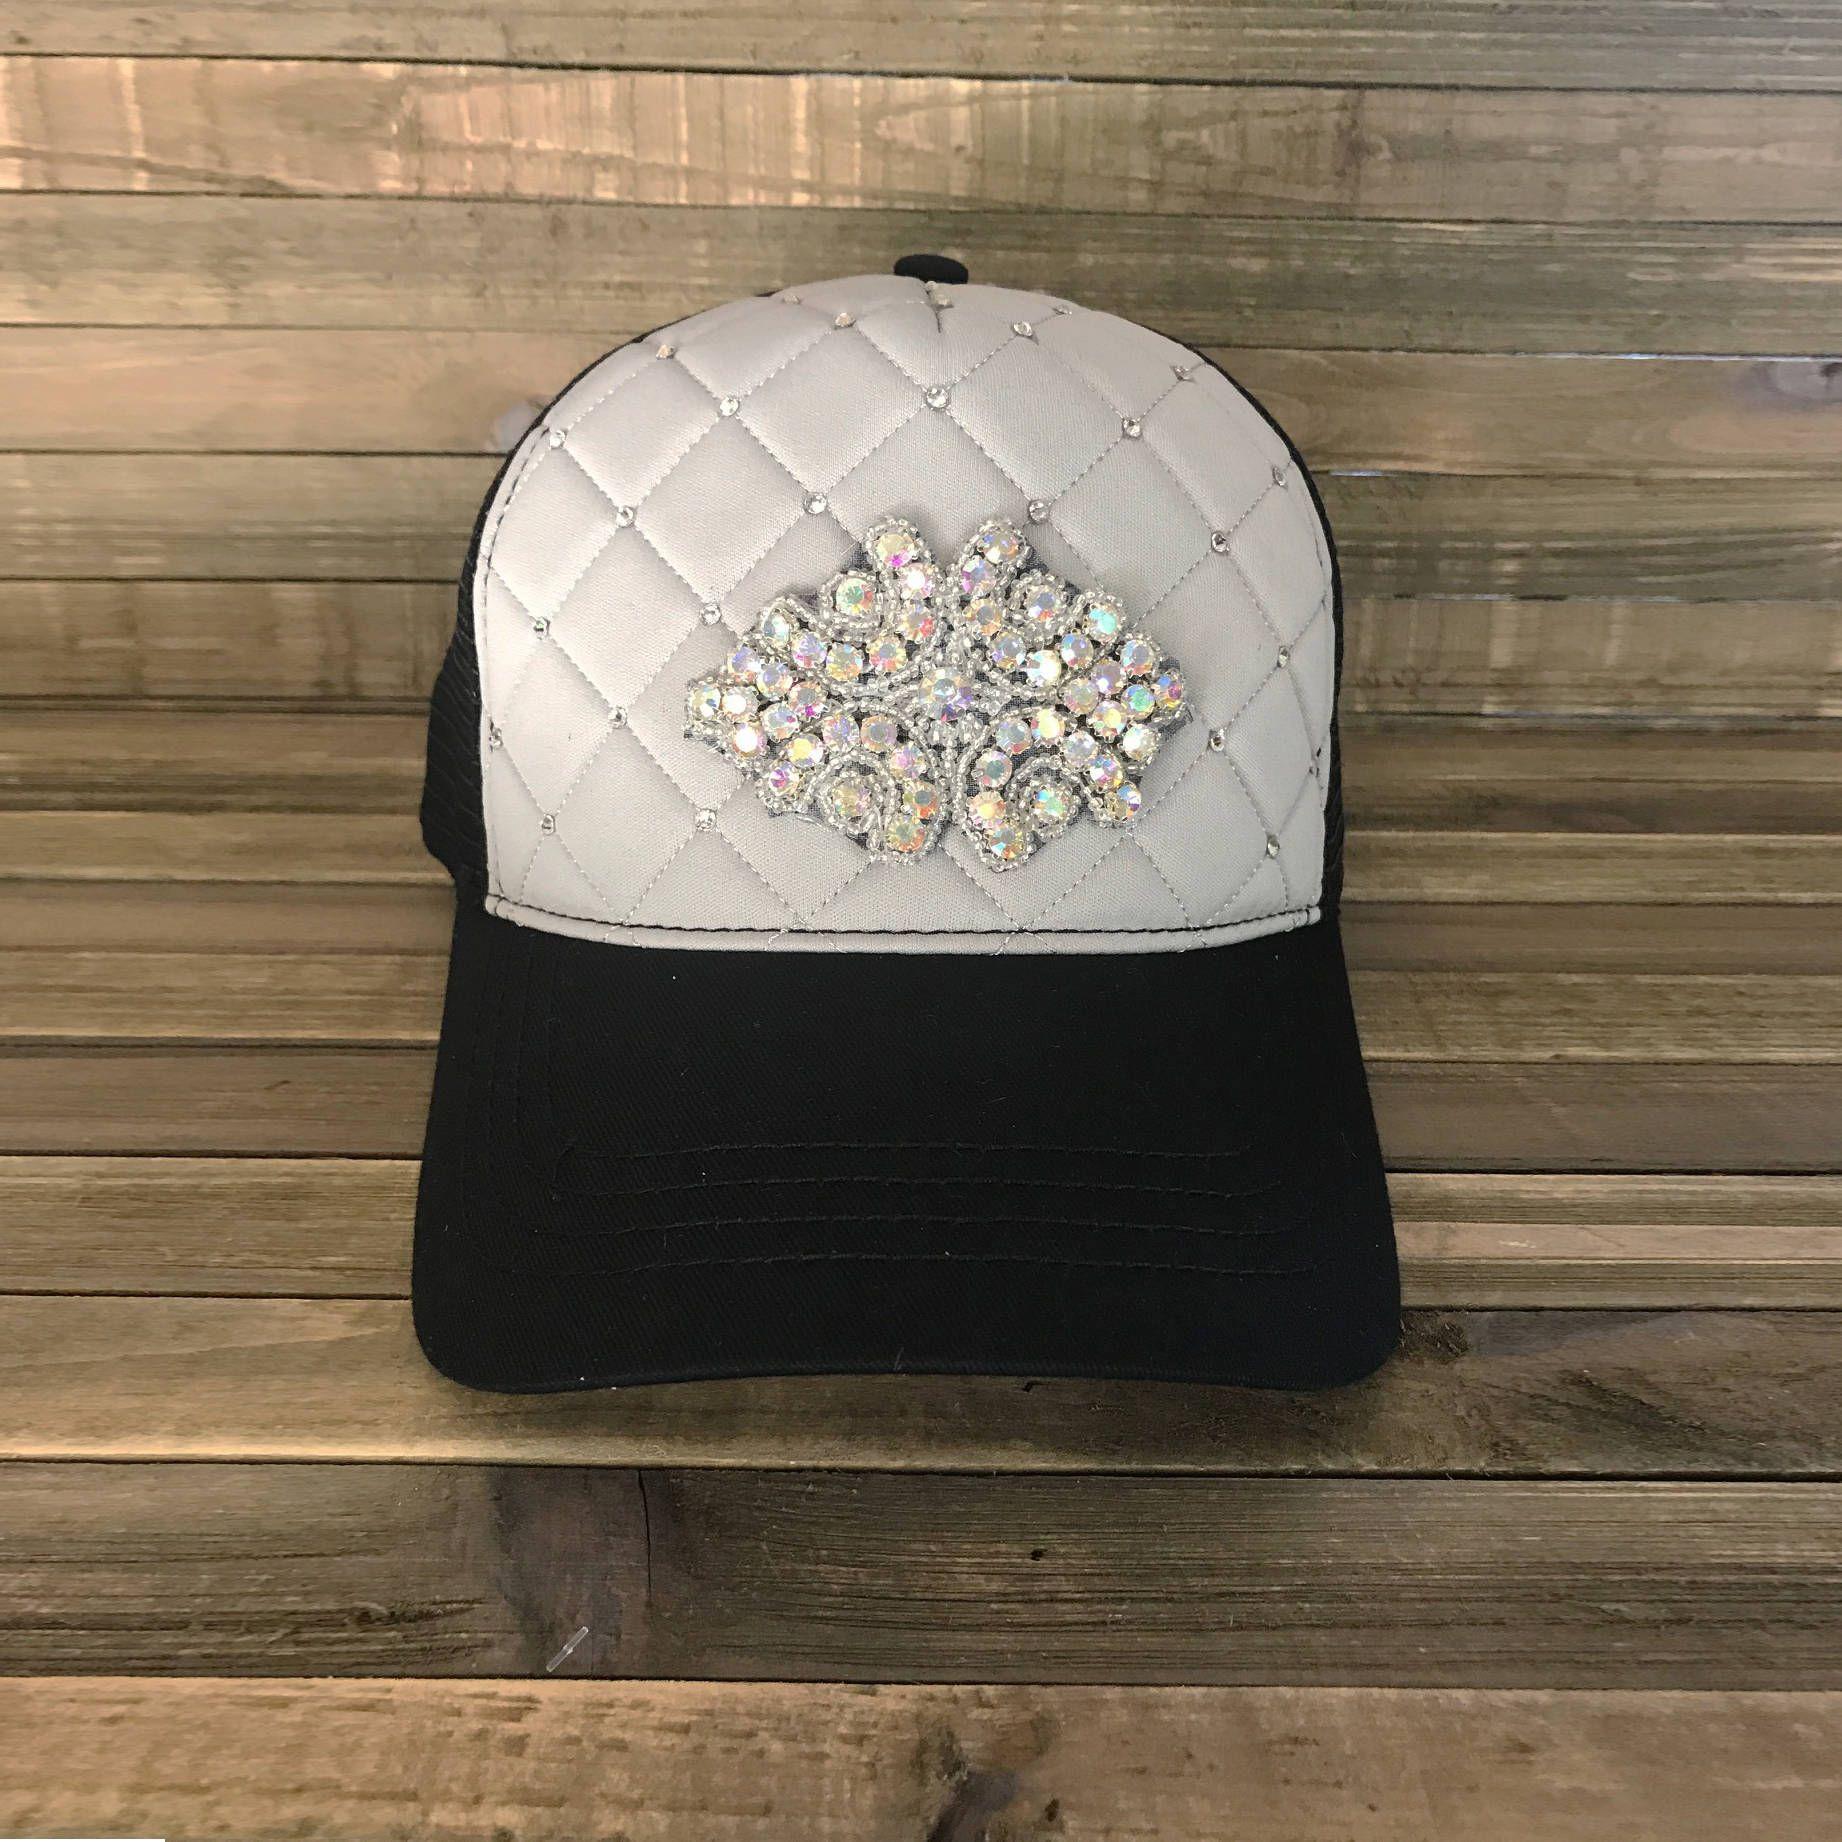 2b27a818 Gray Trucker Hat, Trucker Caps, Rhinetone Hats, Rhinestone Caps, Gray Trucker  Caps, Quilted Hats, Quilted Trucker Hat, Gray Rhinestone Hat by ...